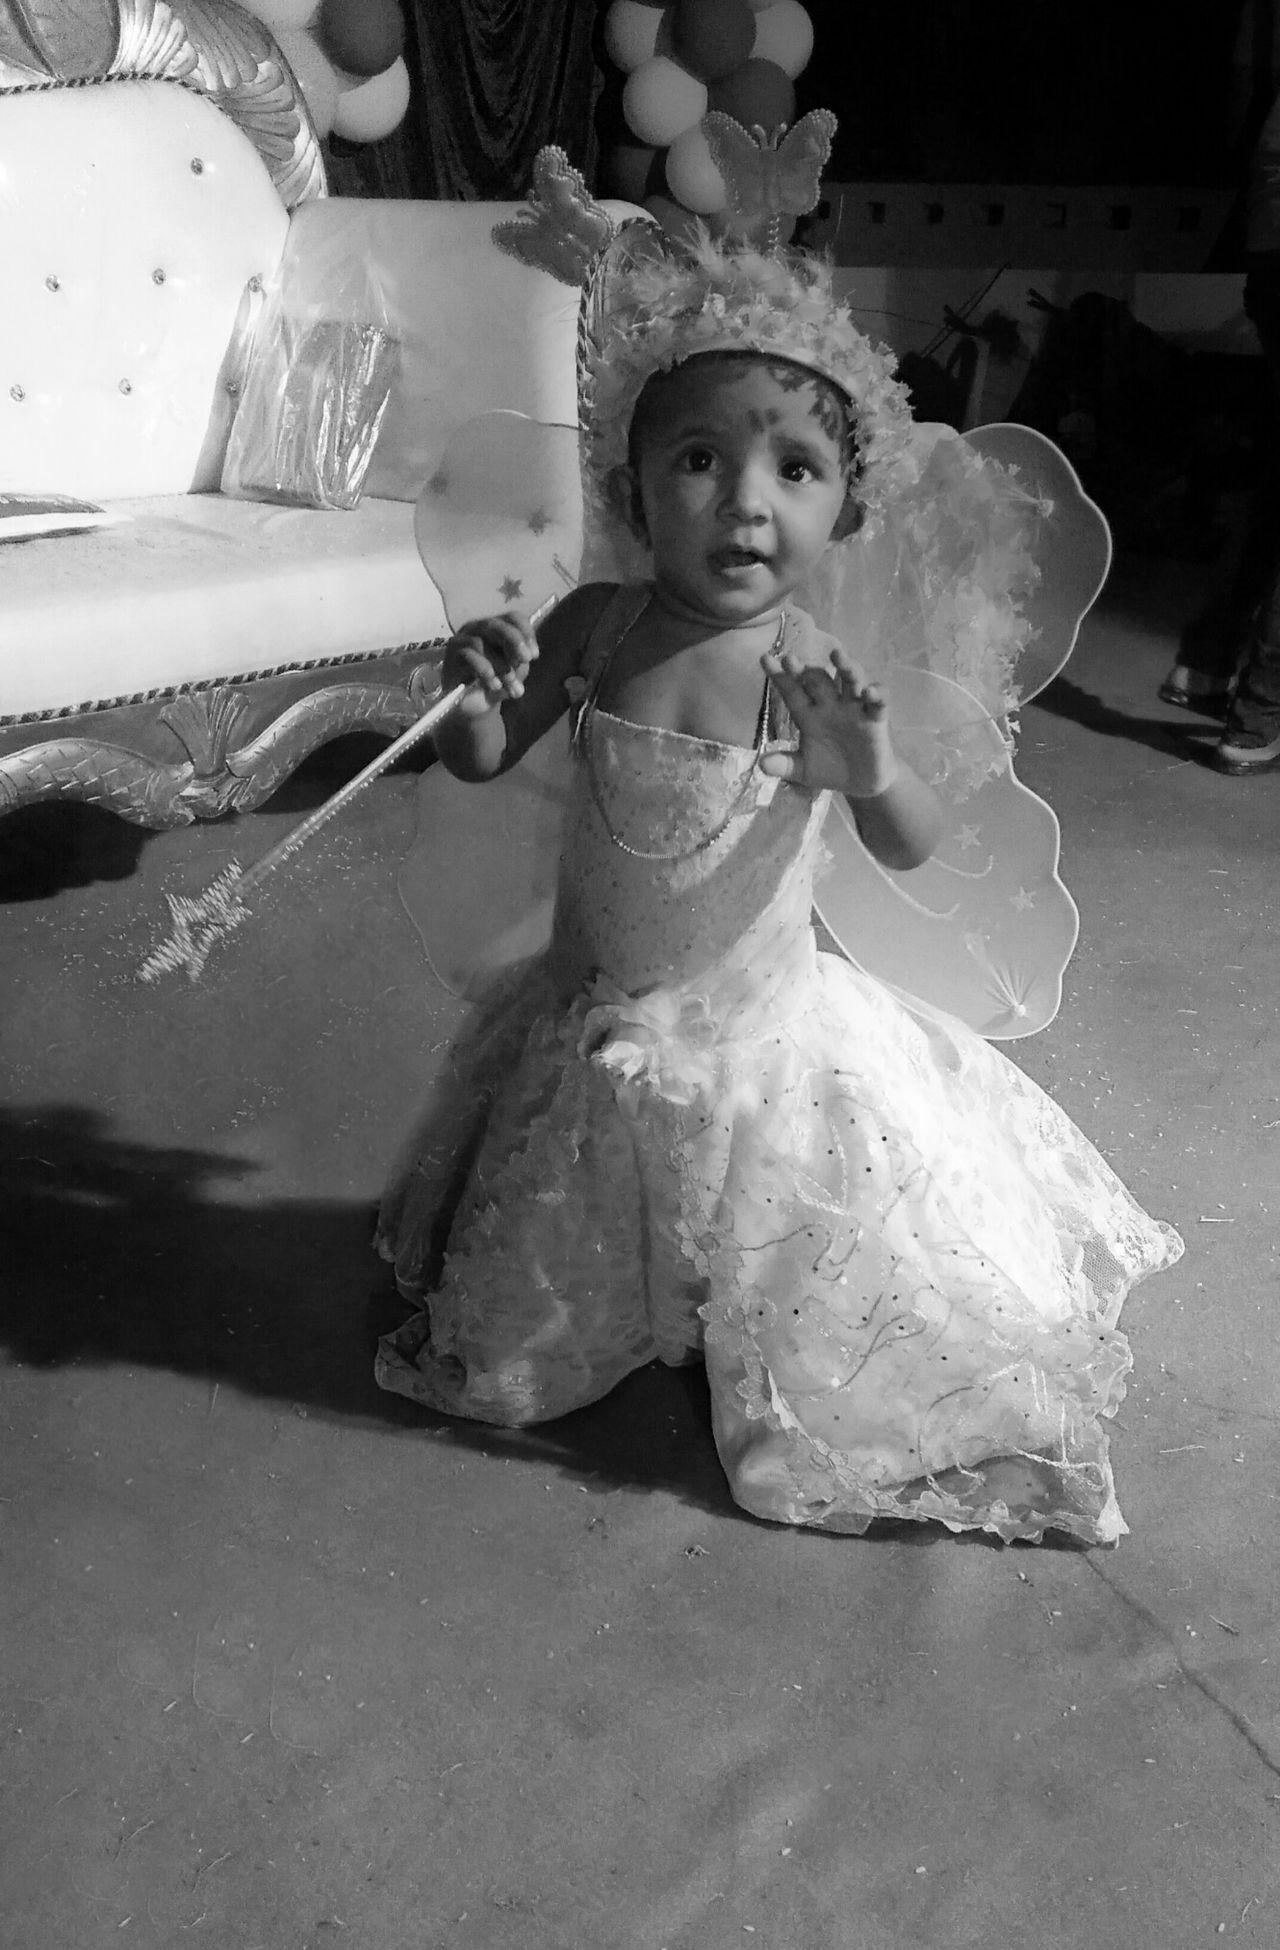 Babygirl Birthday Birthdaygirl Angel Kid Blackandwhite Little Girl Angel Wings Baby ❤ Cute Cute Girl Childhood Smiling Girls Happiness Full Length Cheerful One Girl Only Portrait Outdoors Child Children Only